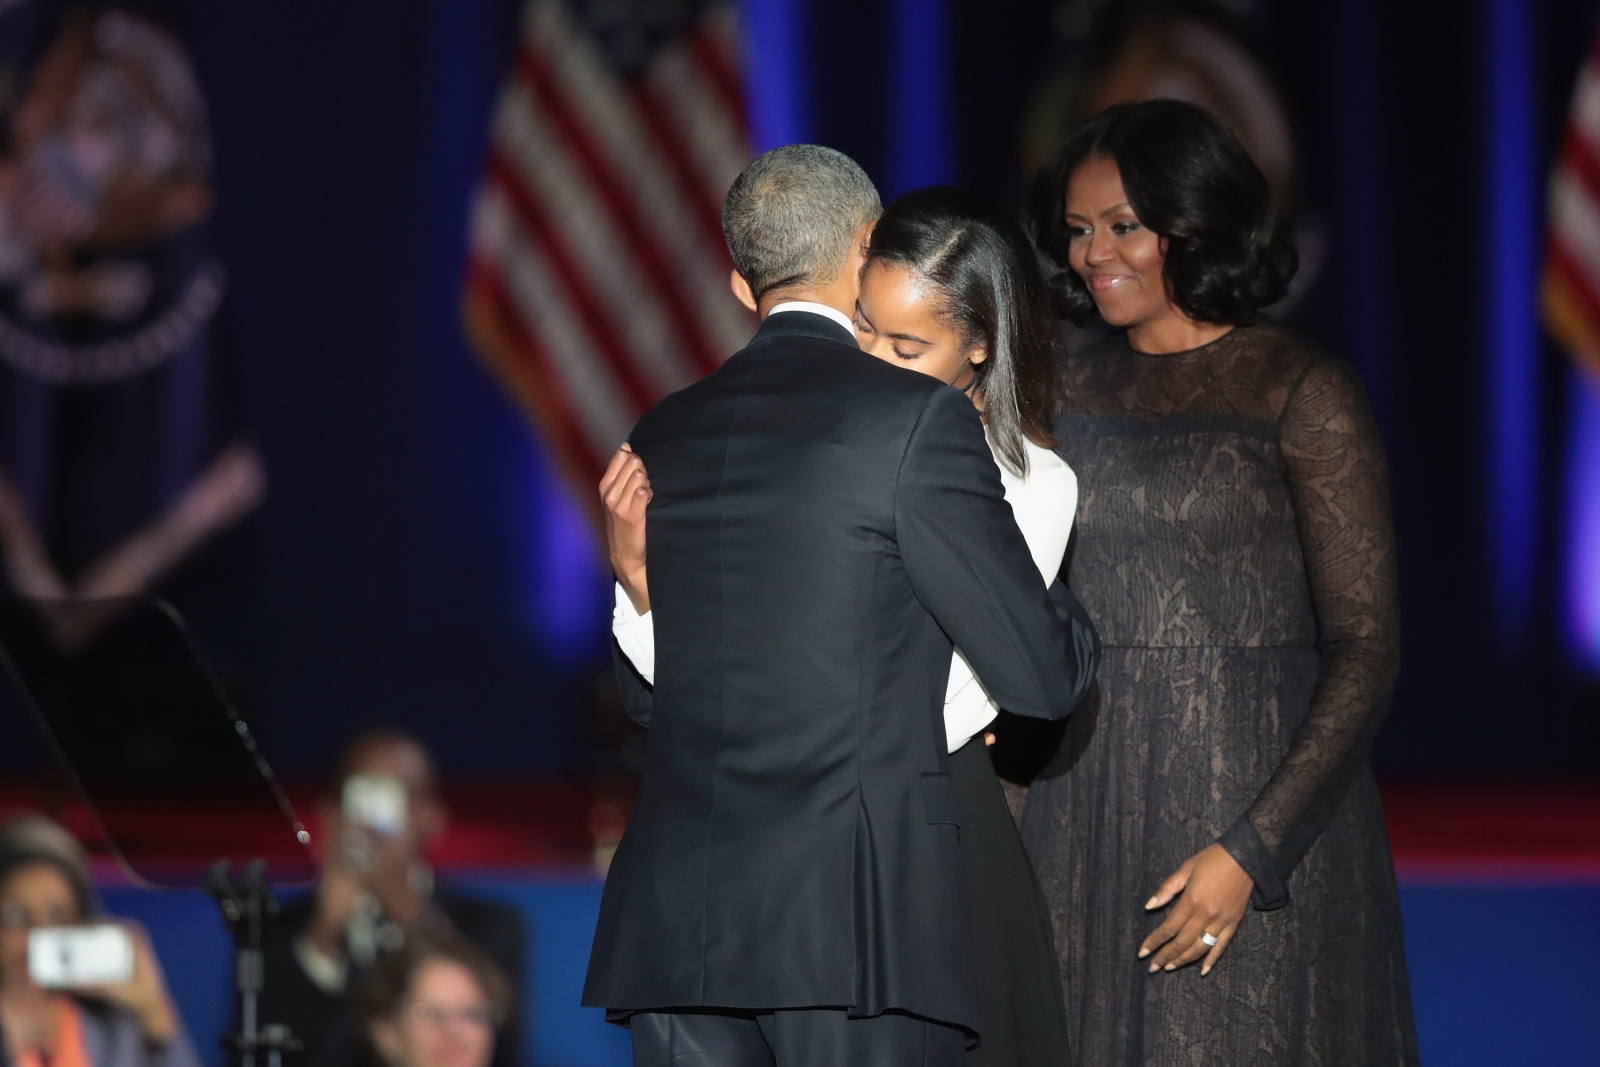 Obama farewell speech: Five main takeaways